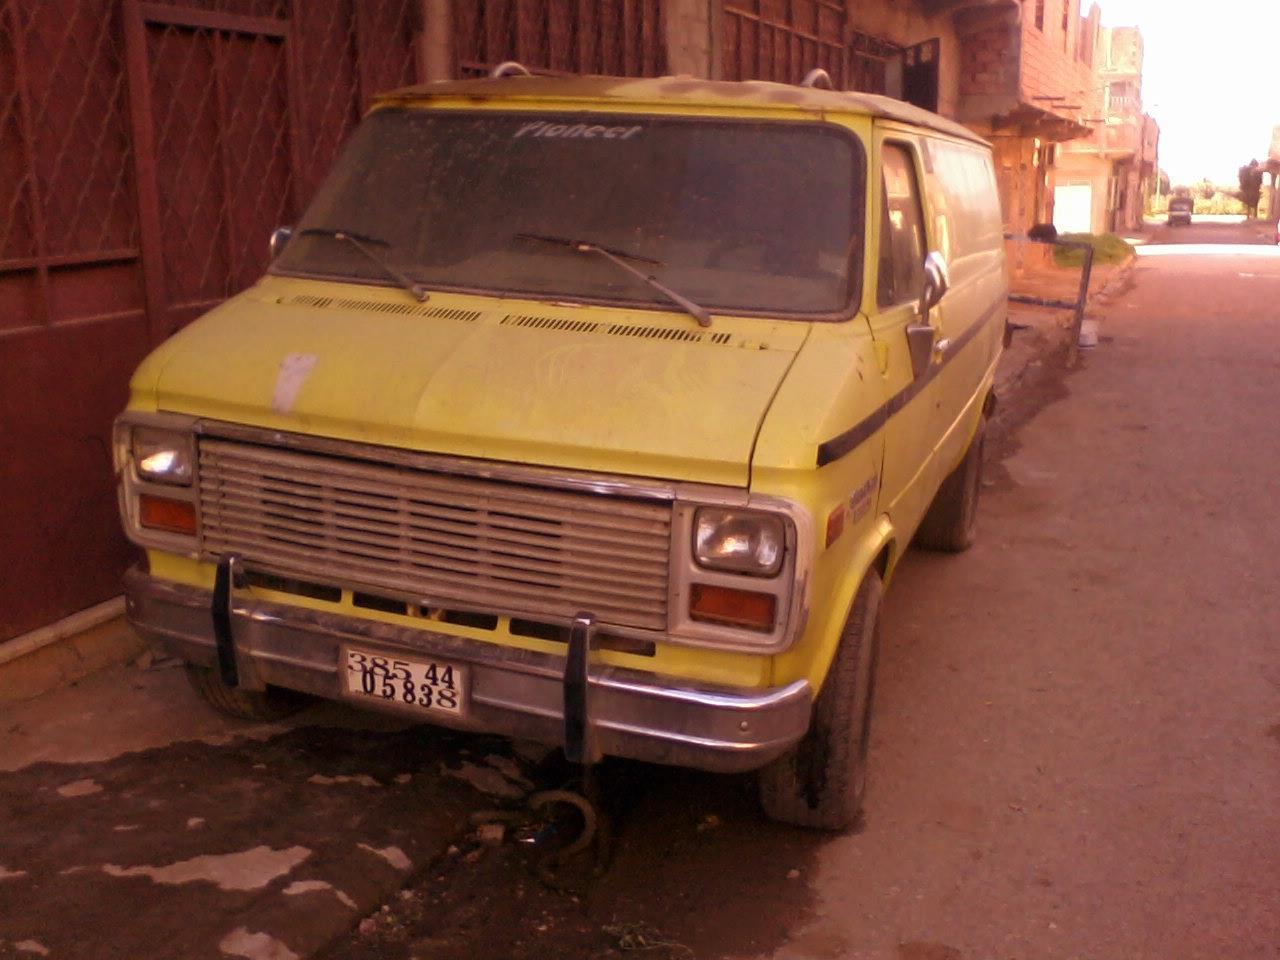 Chevy+van+hmadna+relizane+(2).jpg